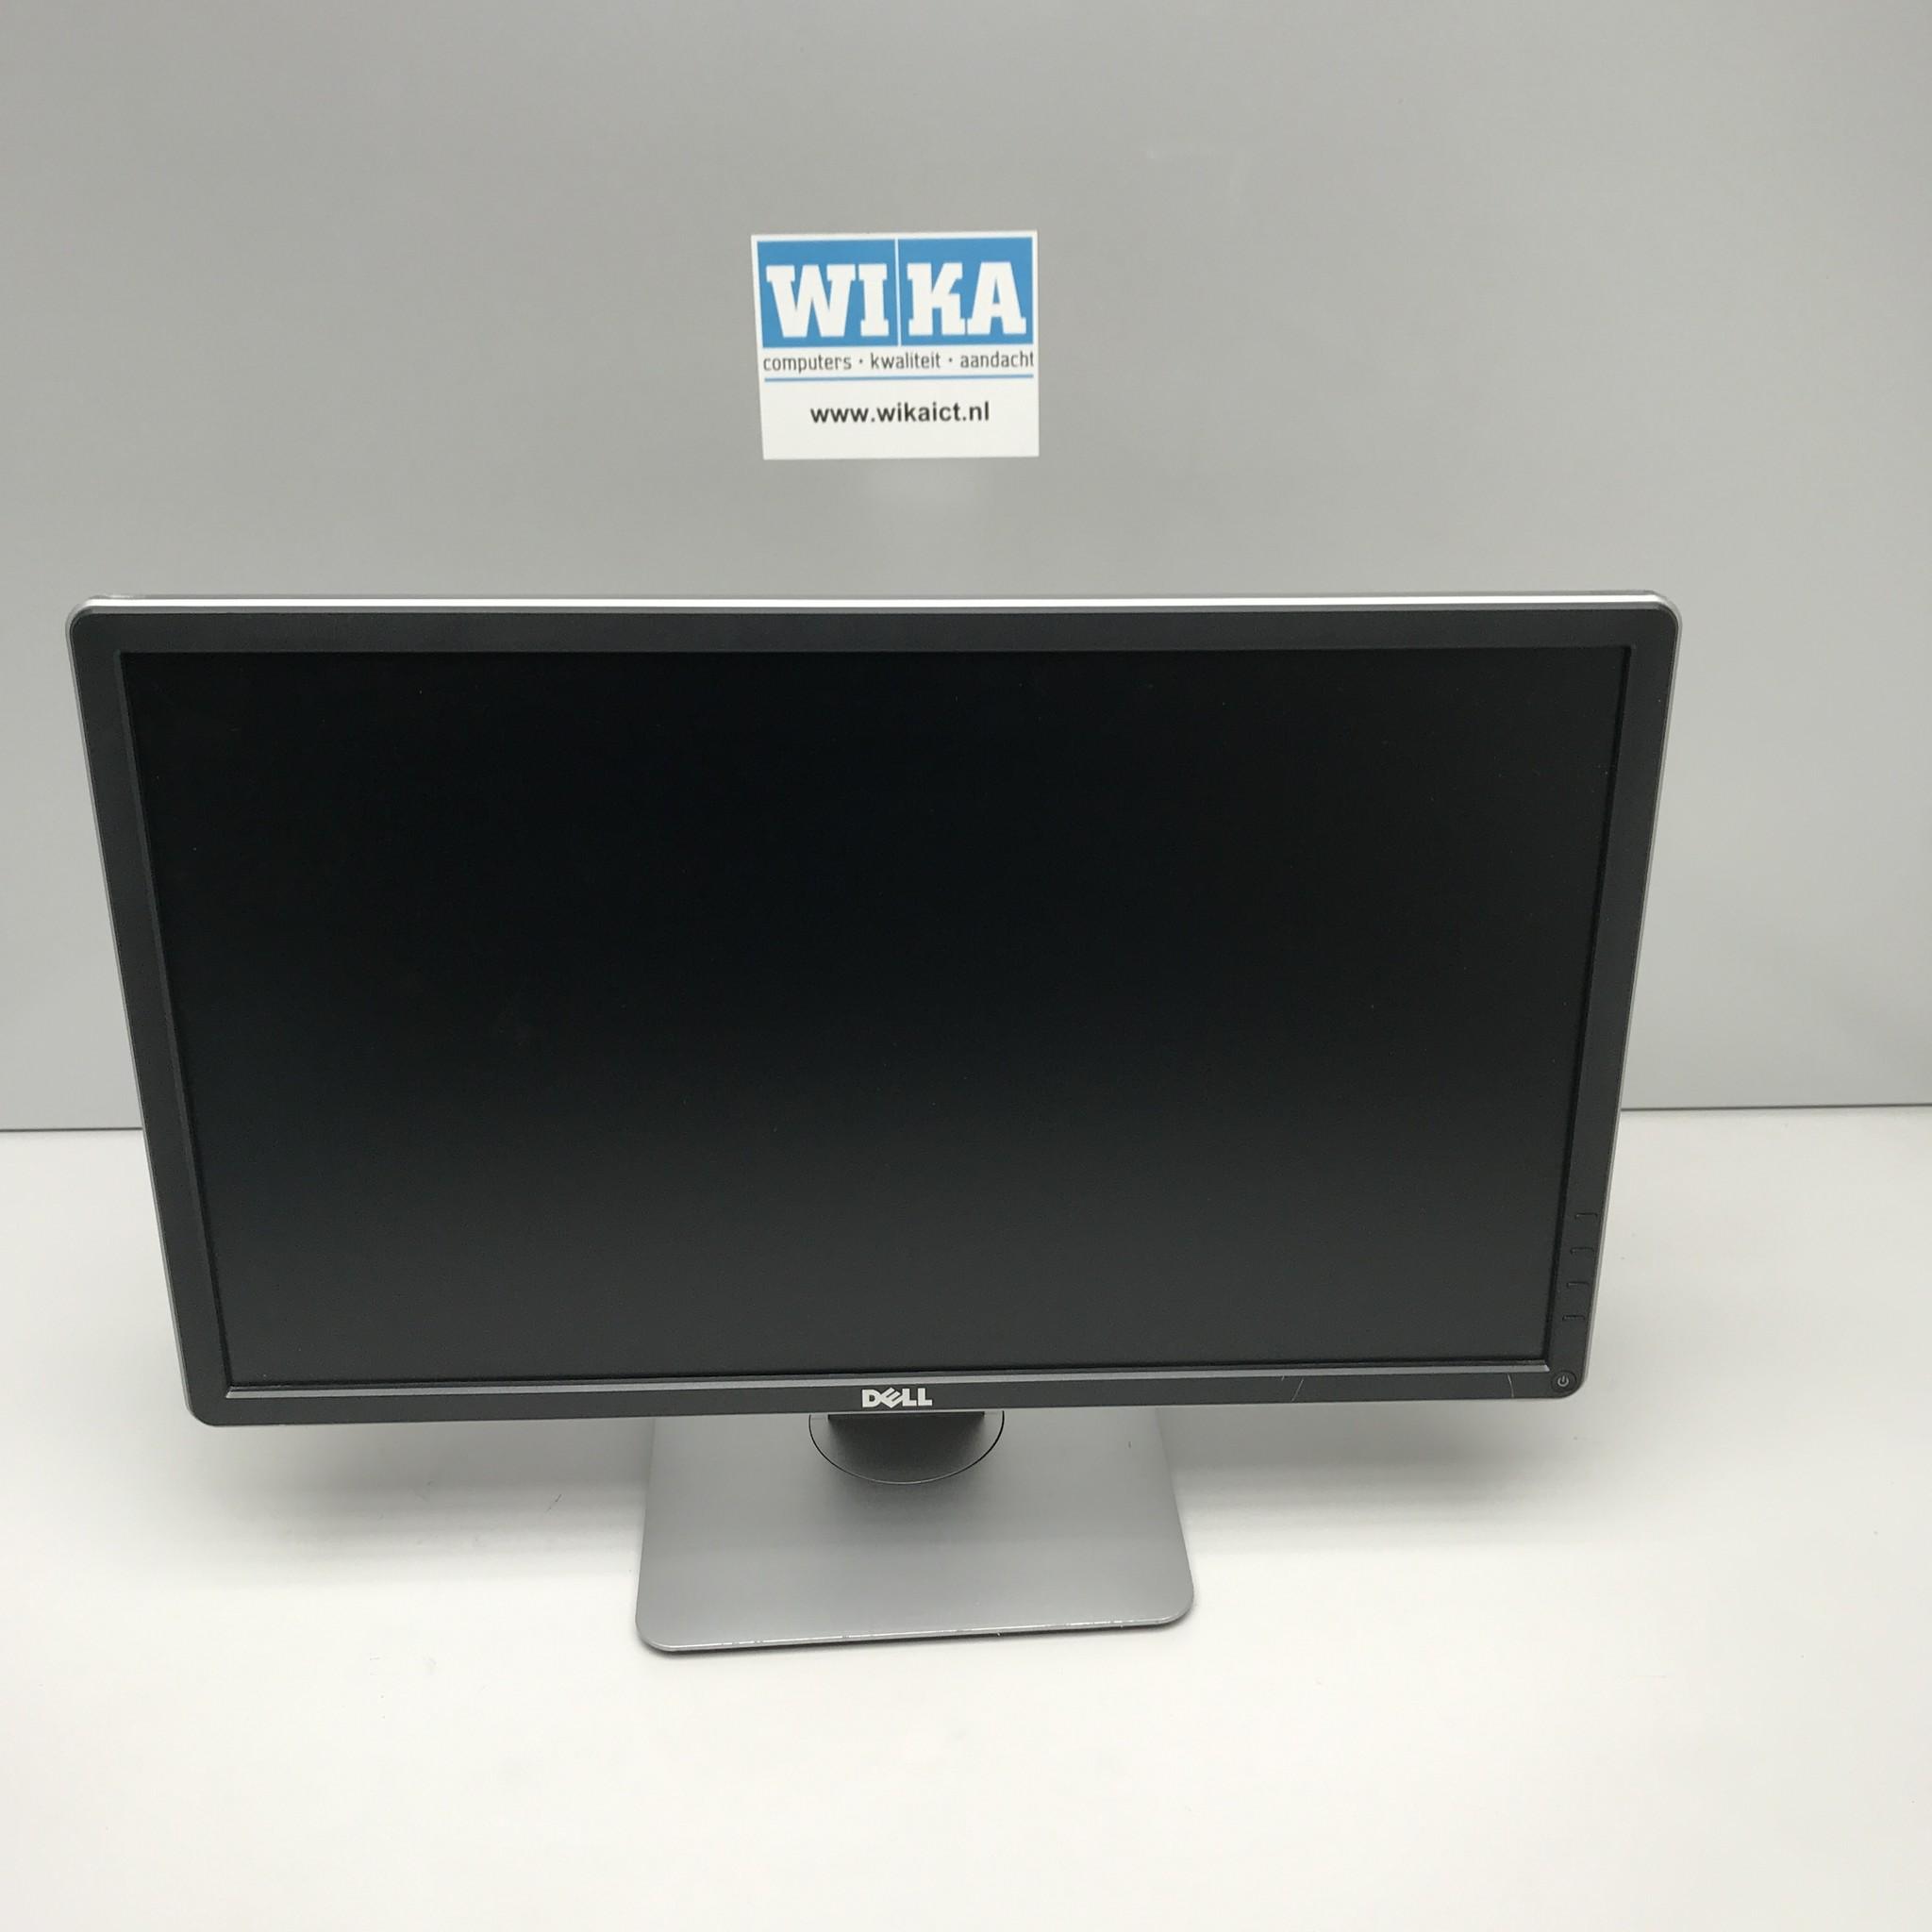 Dell P2314Hc 23 inch Full HD led IPS monitor